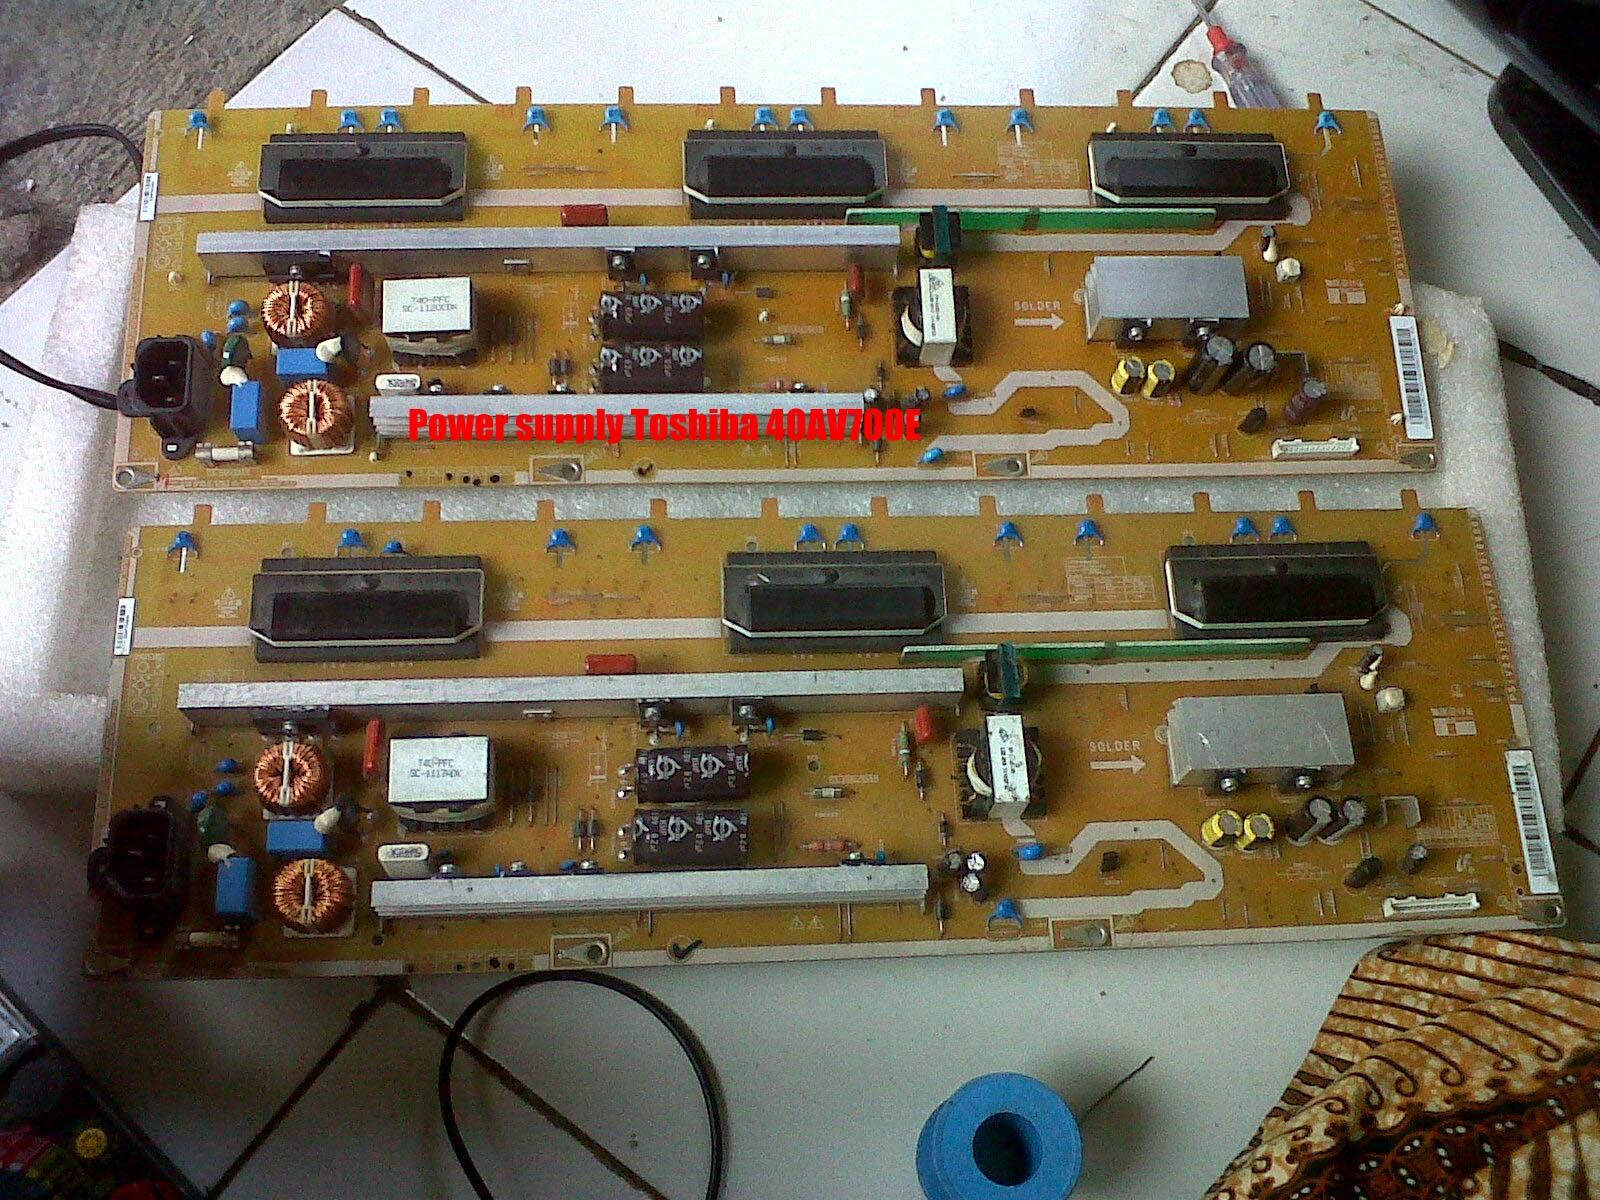 Power Supply Toshiba 40AV700E